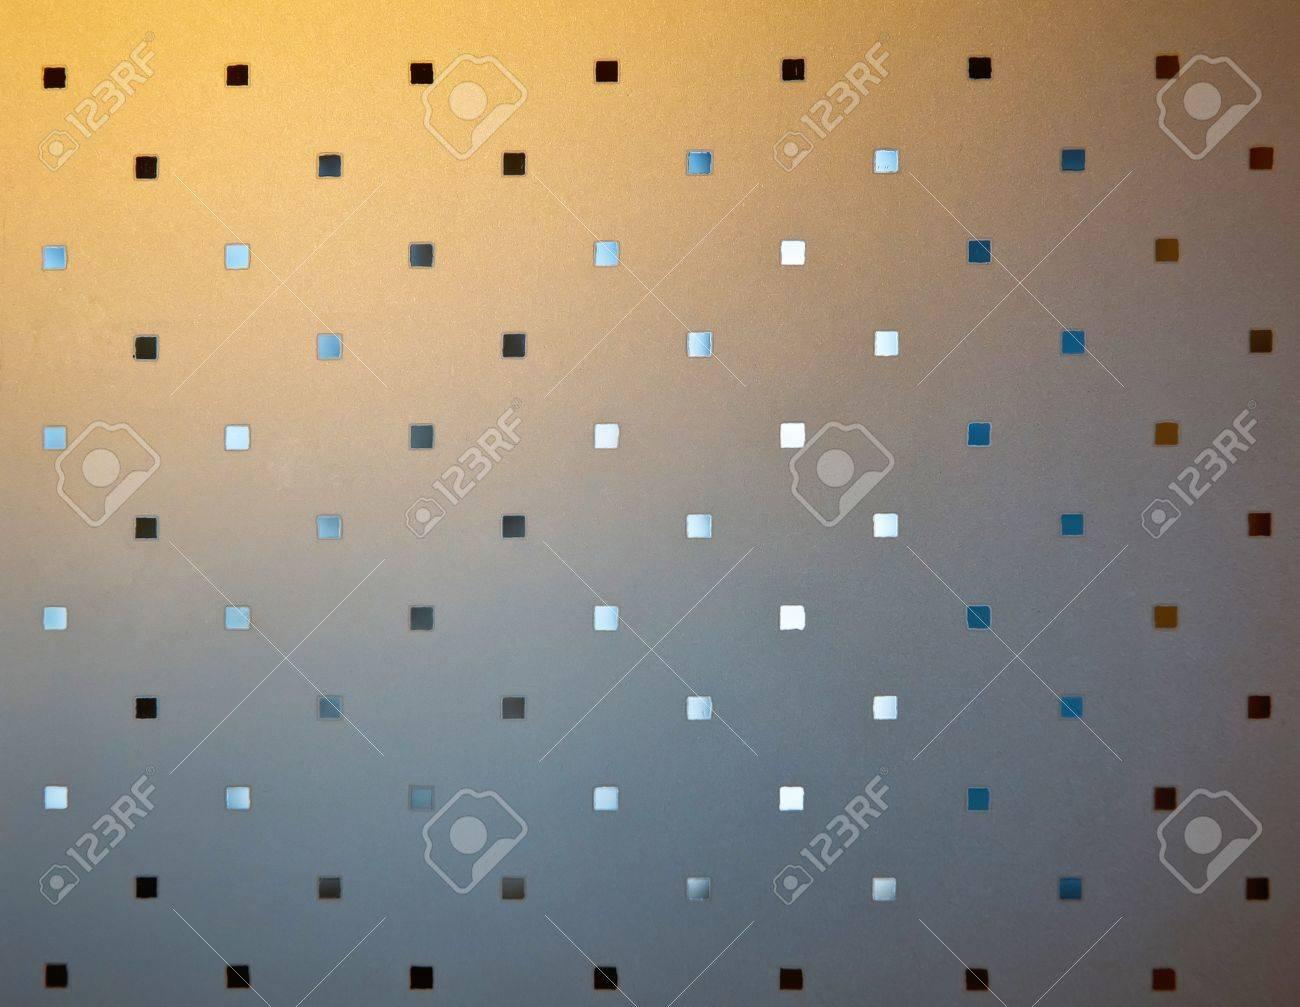 section - glass, decorative sandblasting. Stock Photo - 20312294